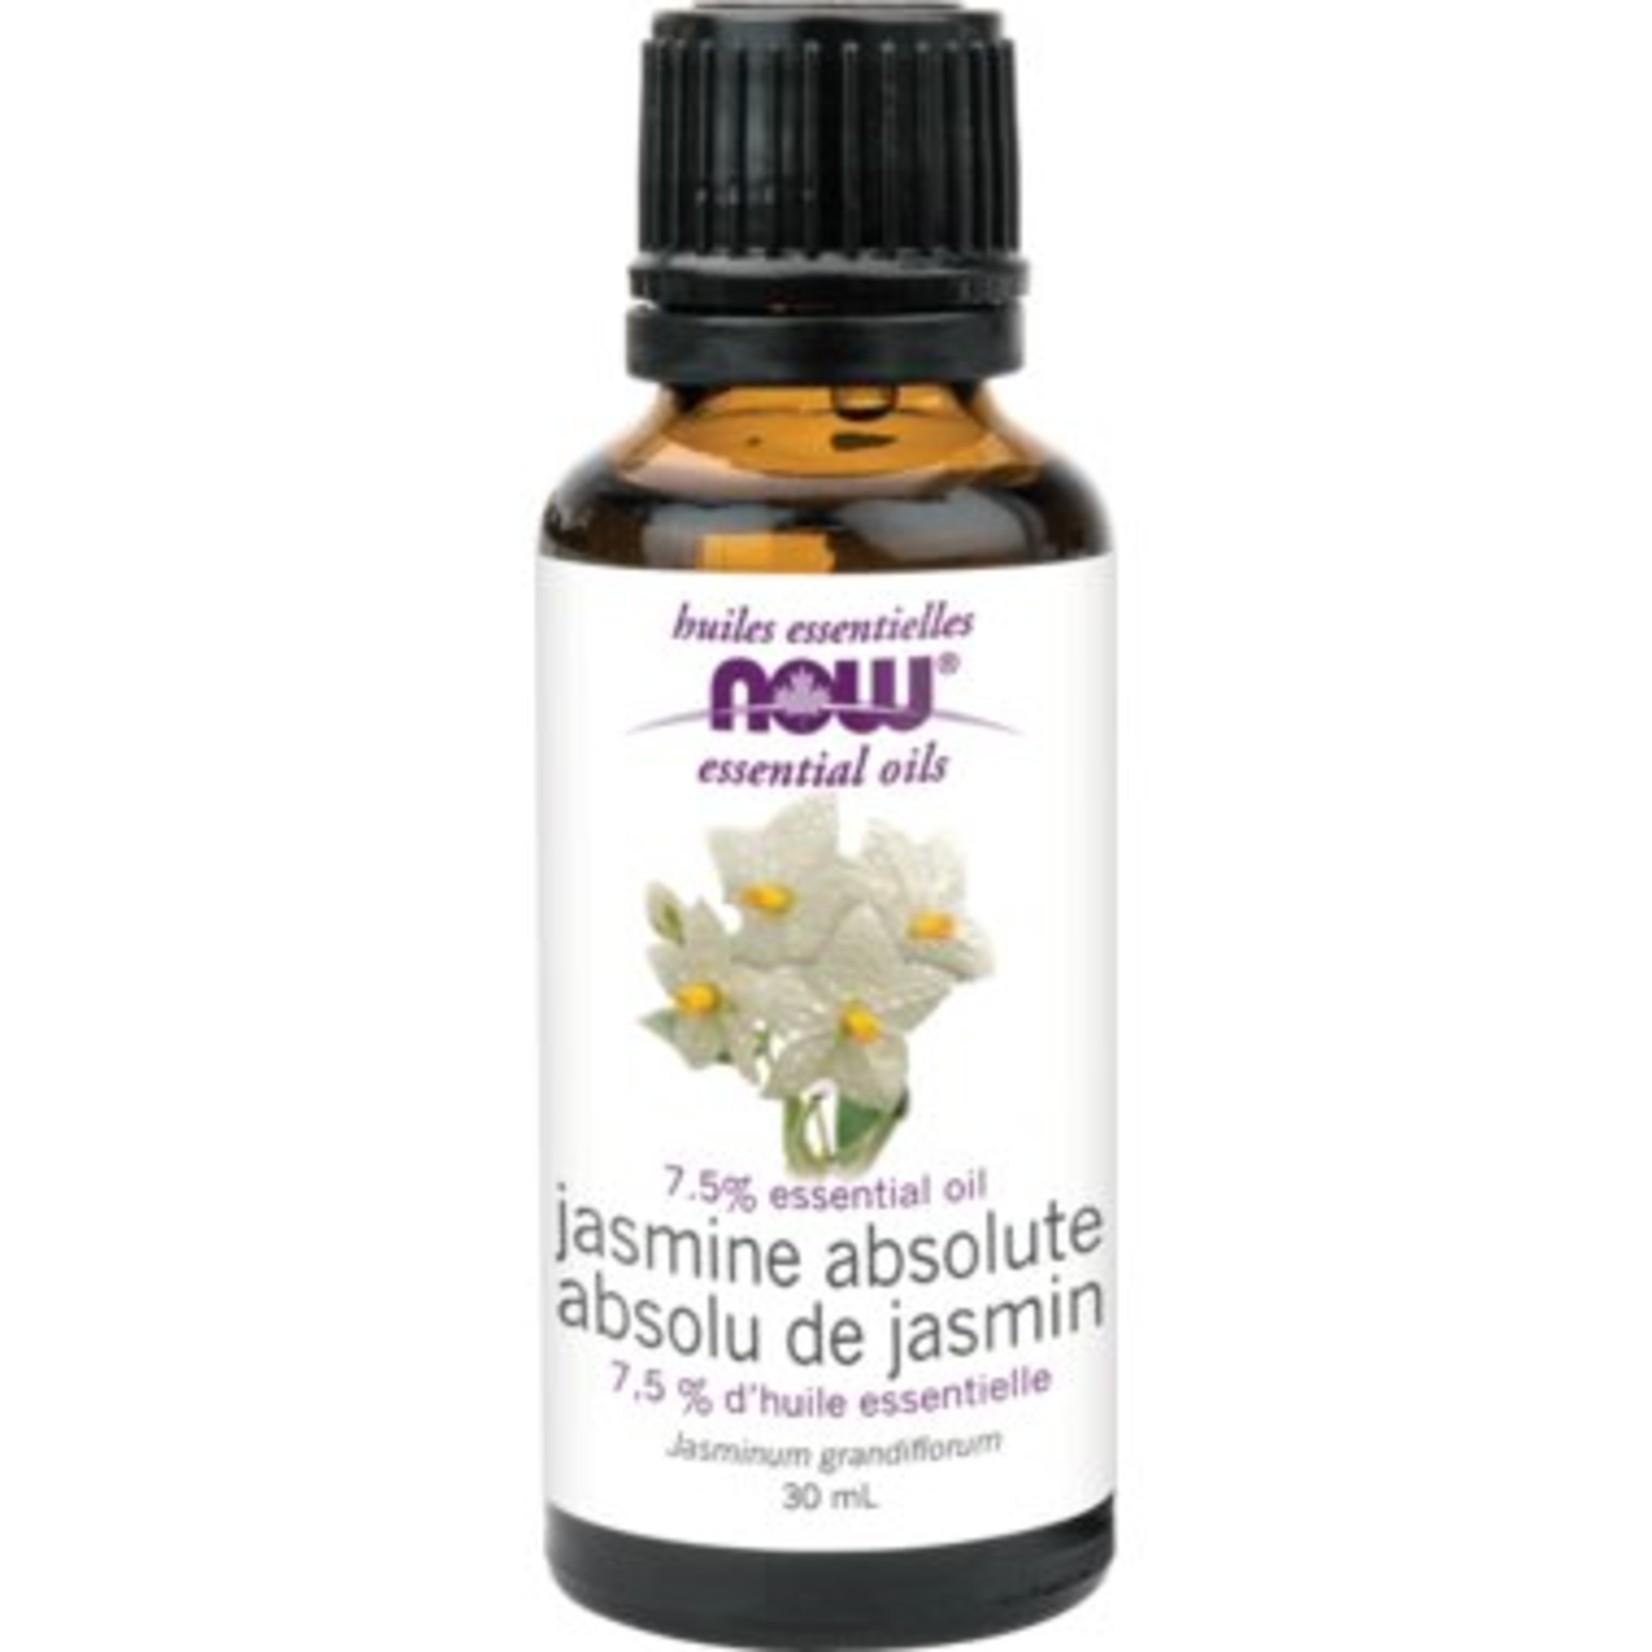 NOW NOW Jasmine Absolute 7.5% 30ml